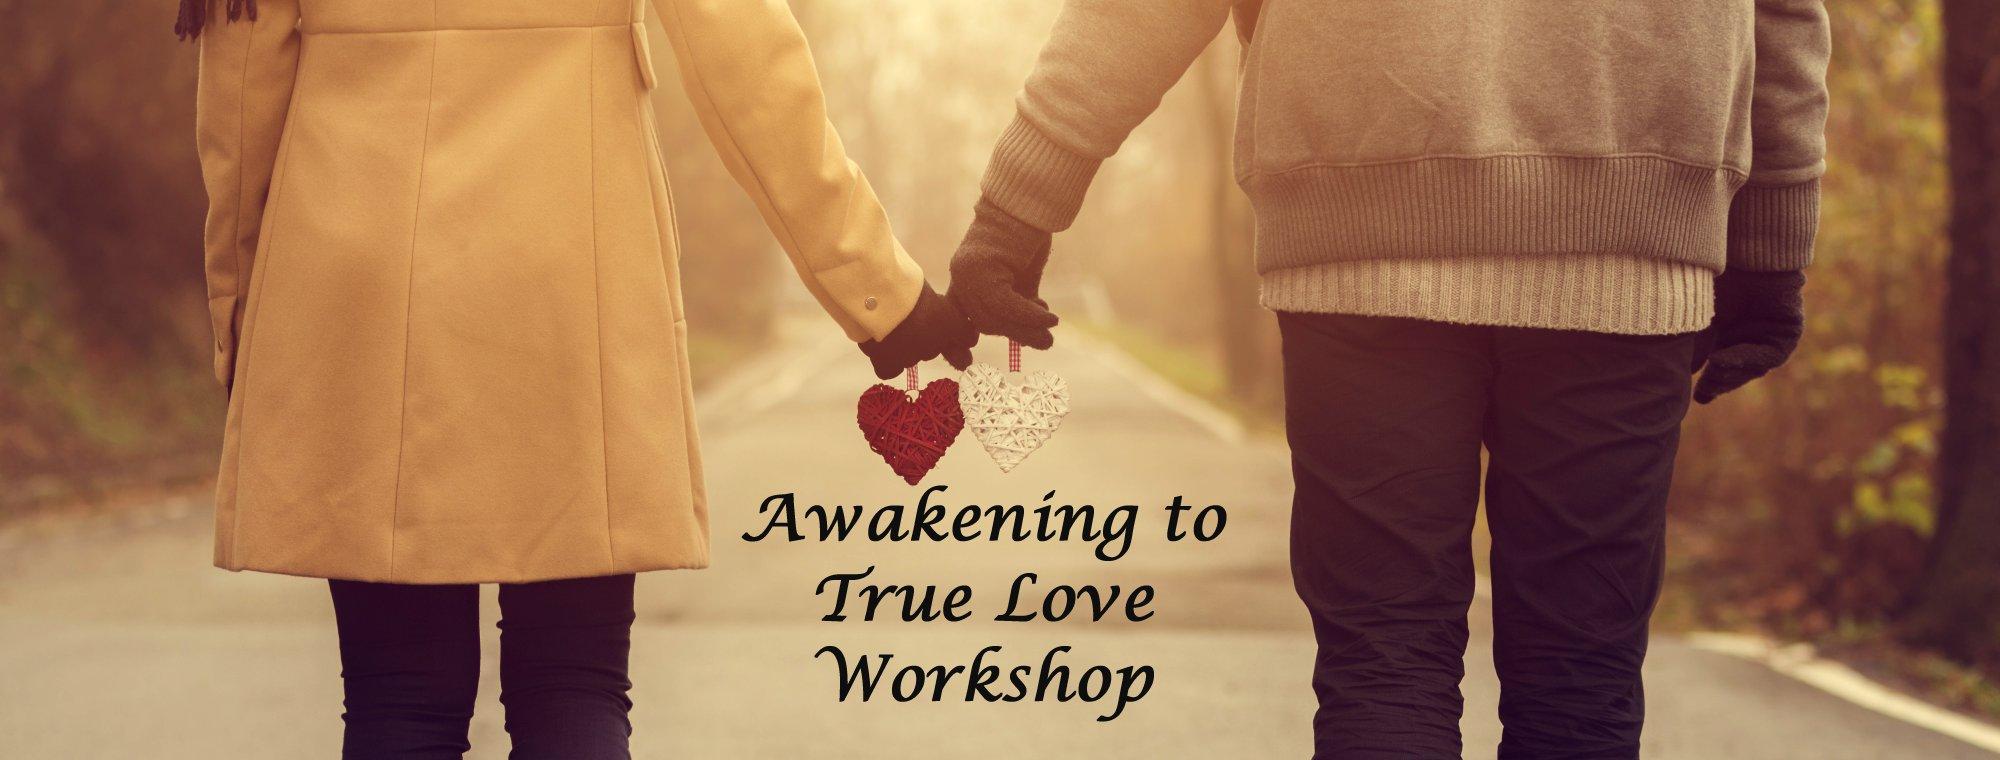 awakening to love workshop sherry lynn marie freels